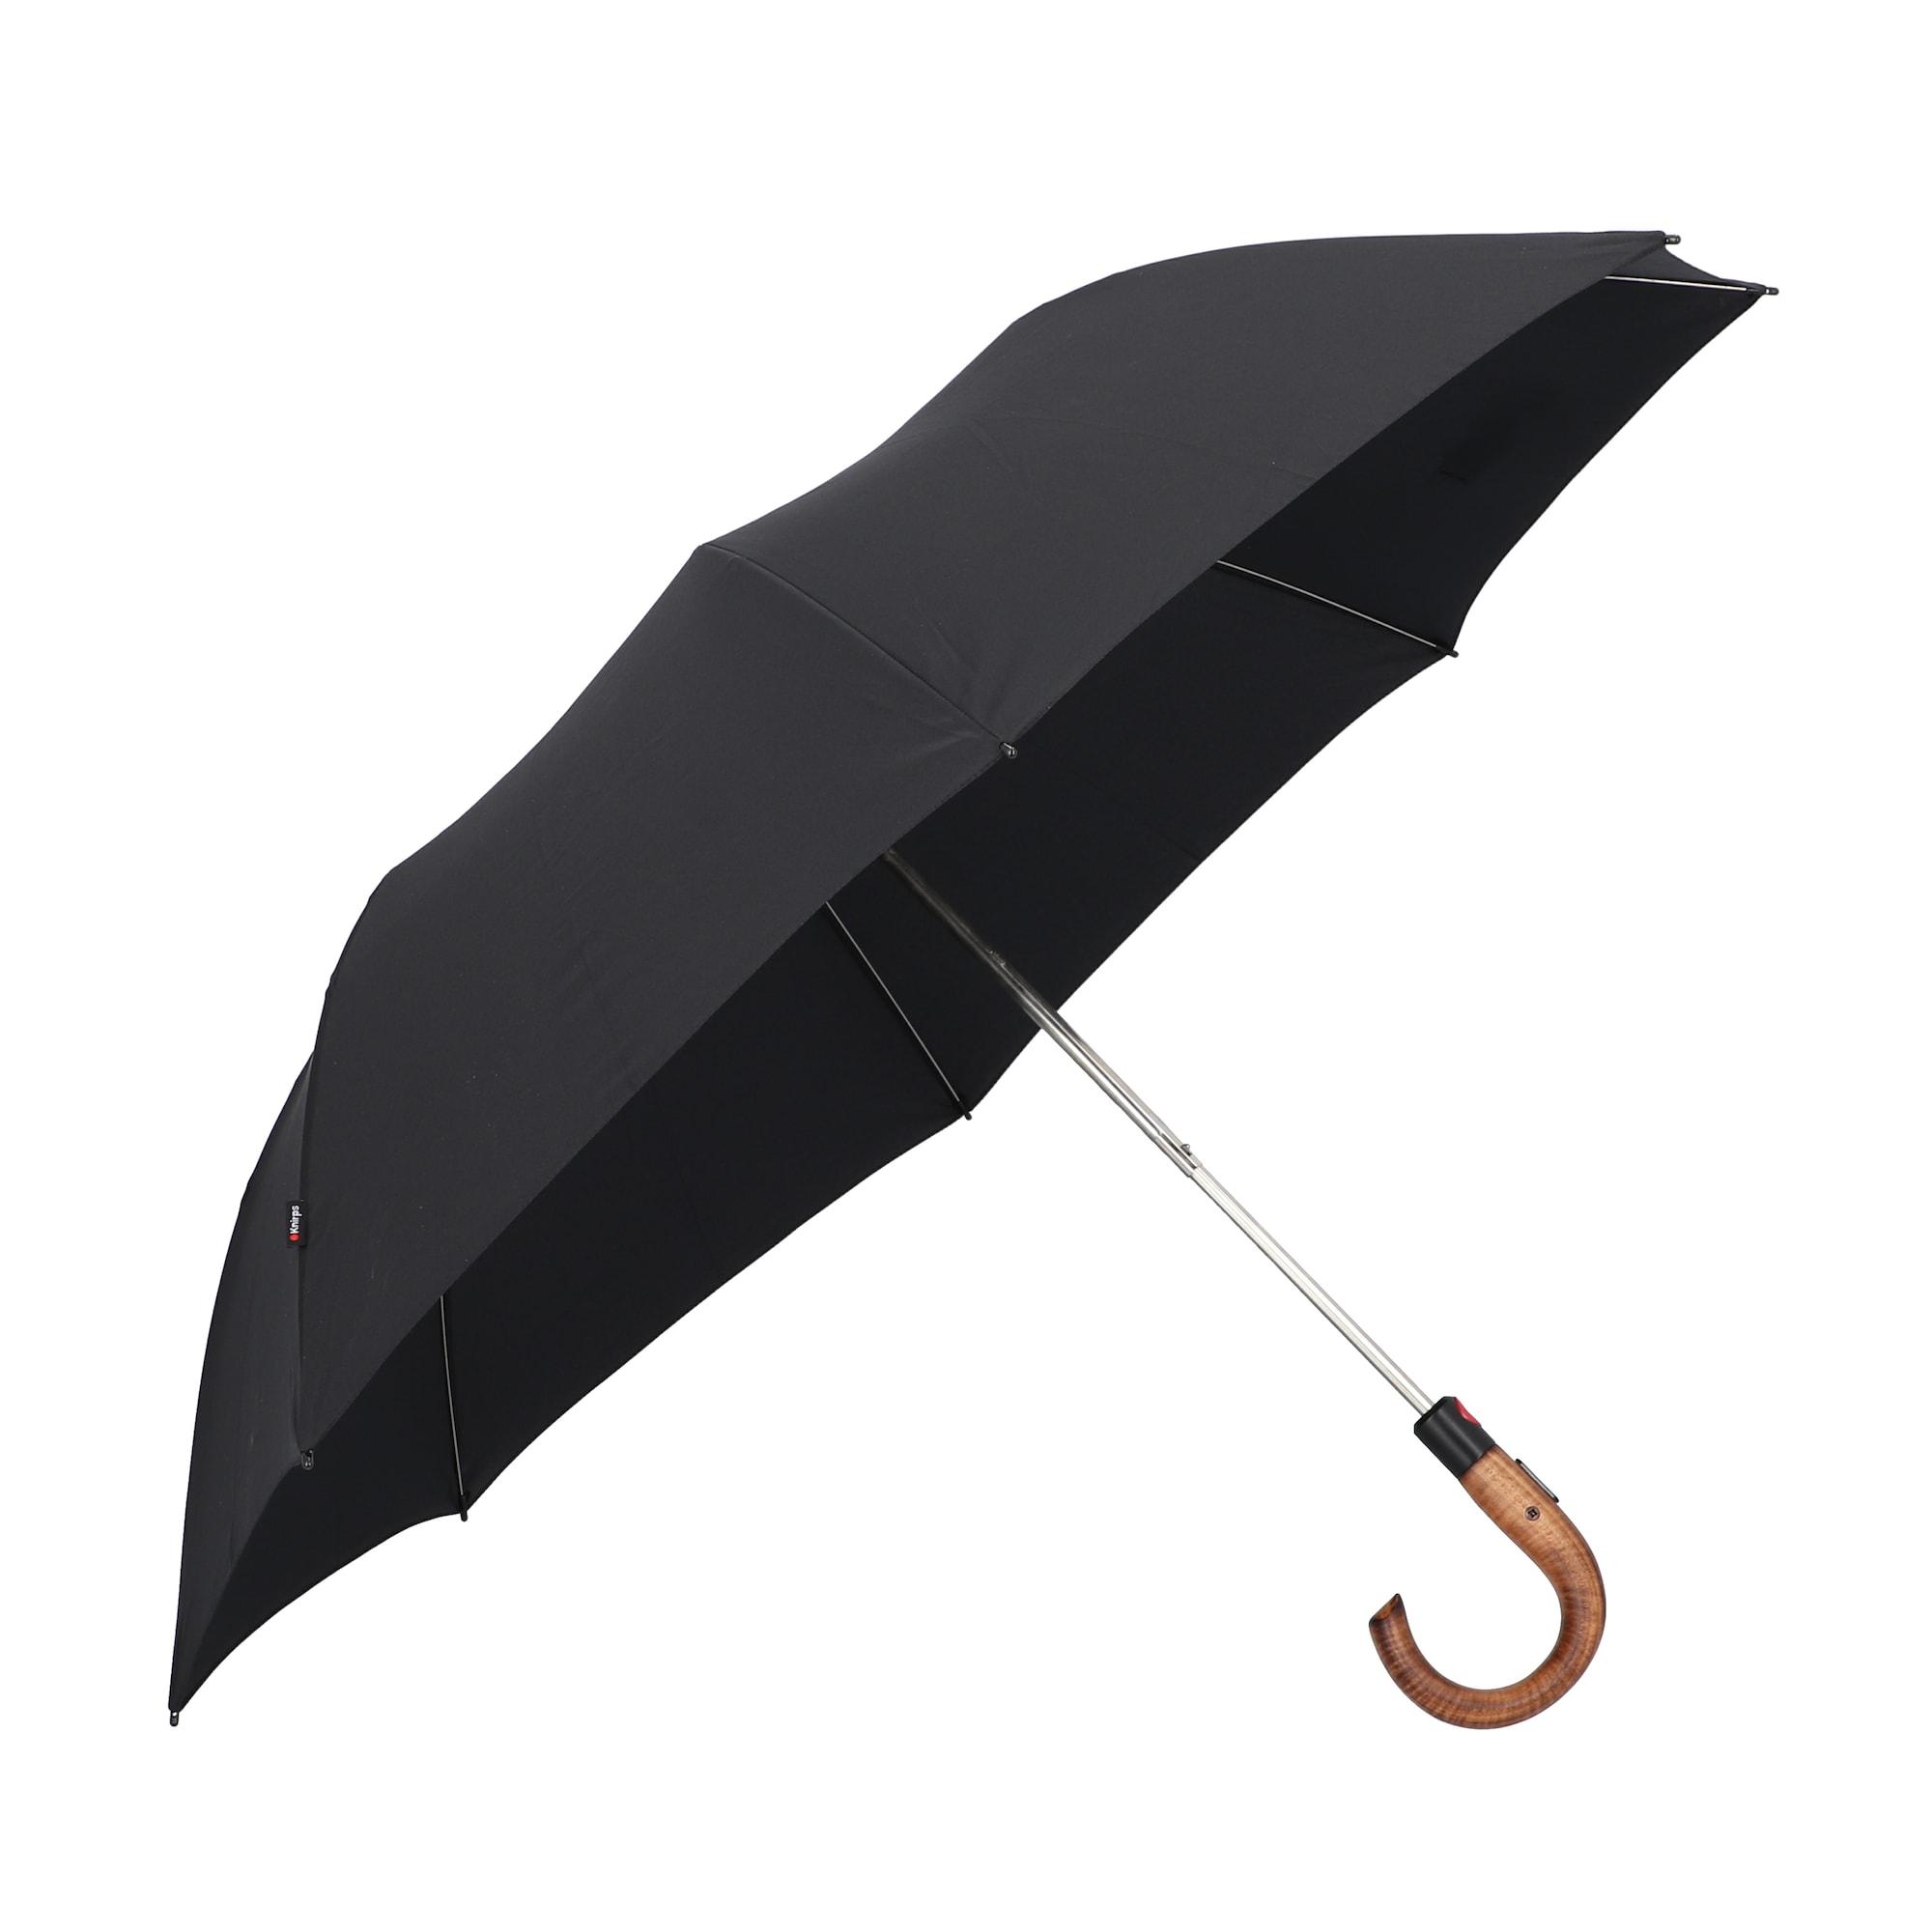 Taschenschirm 'S.570' | Accessoires > Regenschirme > Taschenschirme | knirps